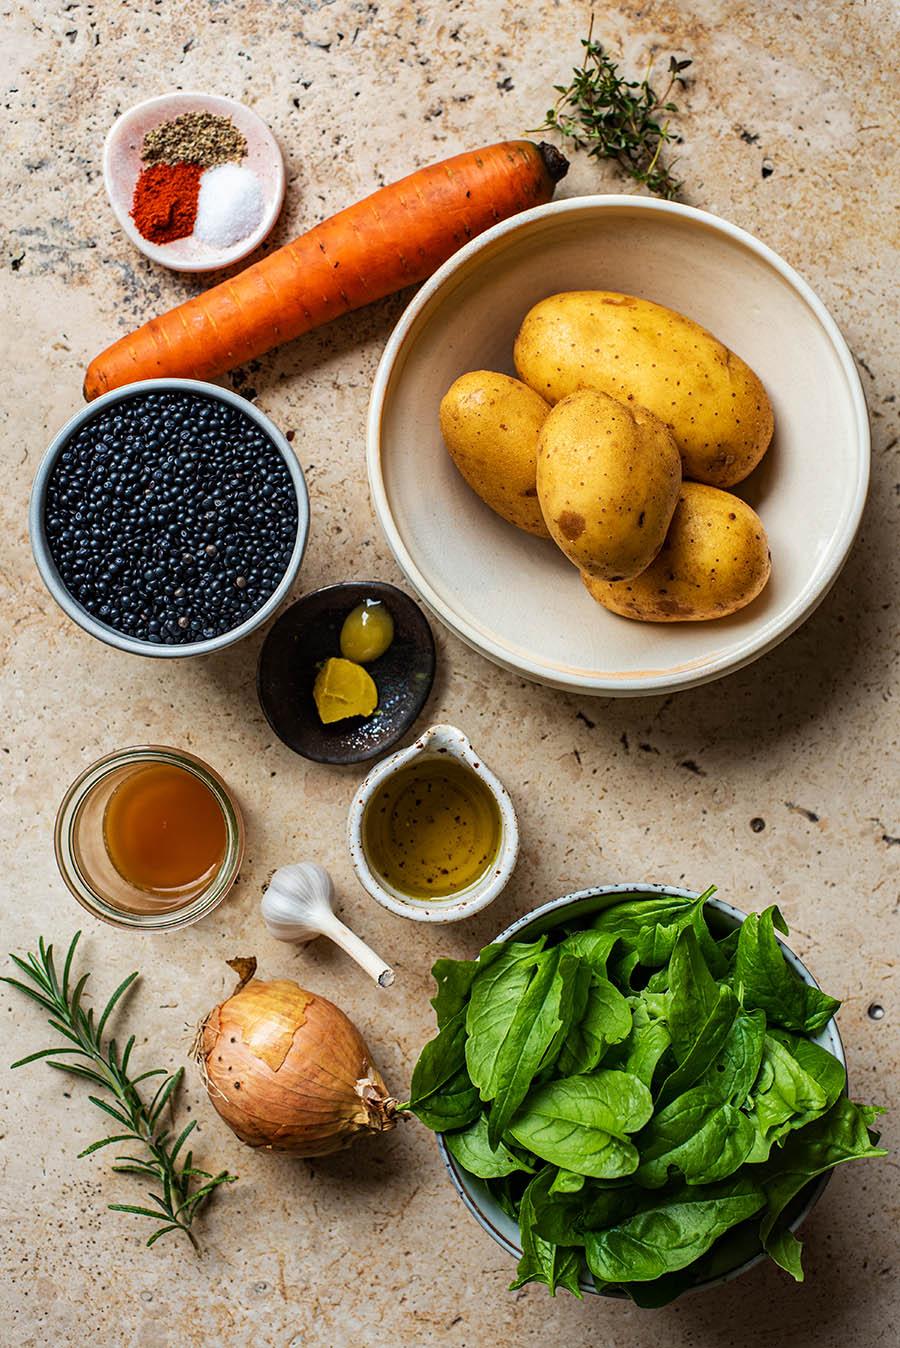 Lentil potato stew ingredients.